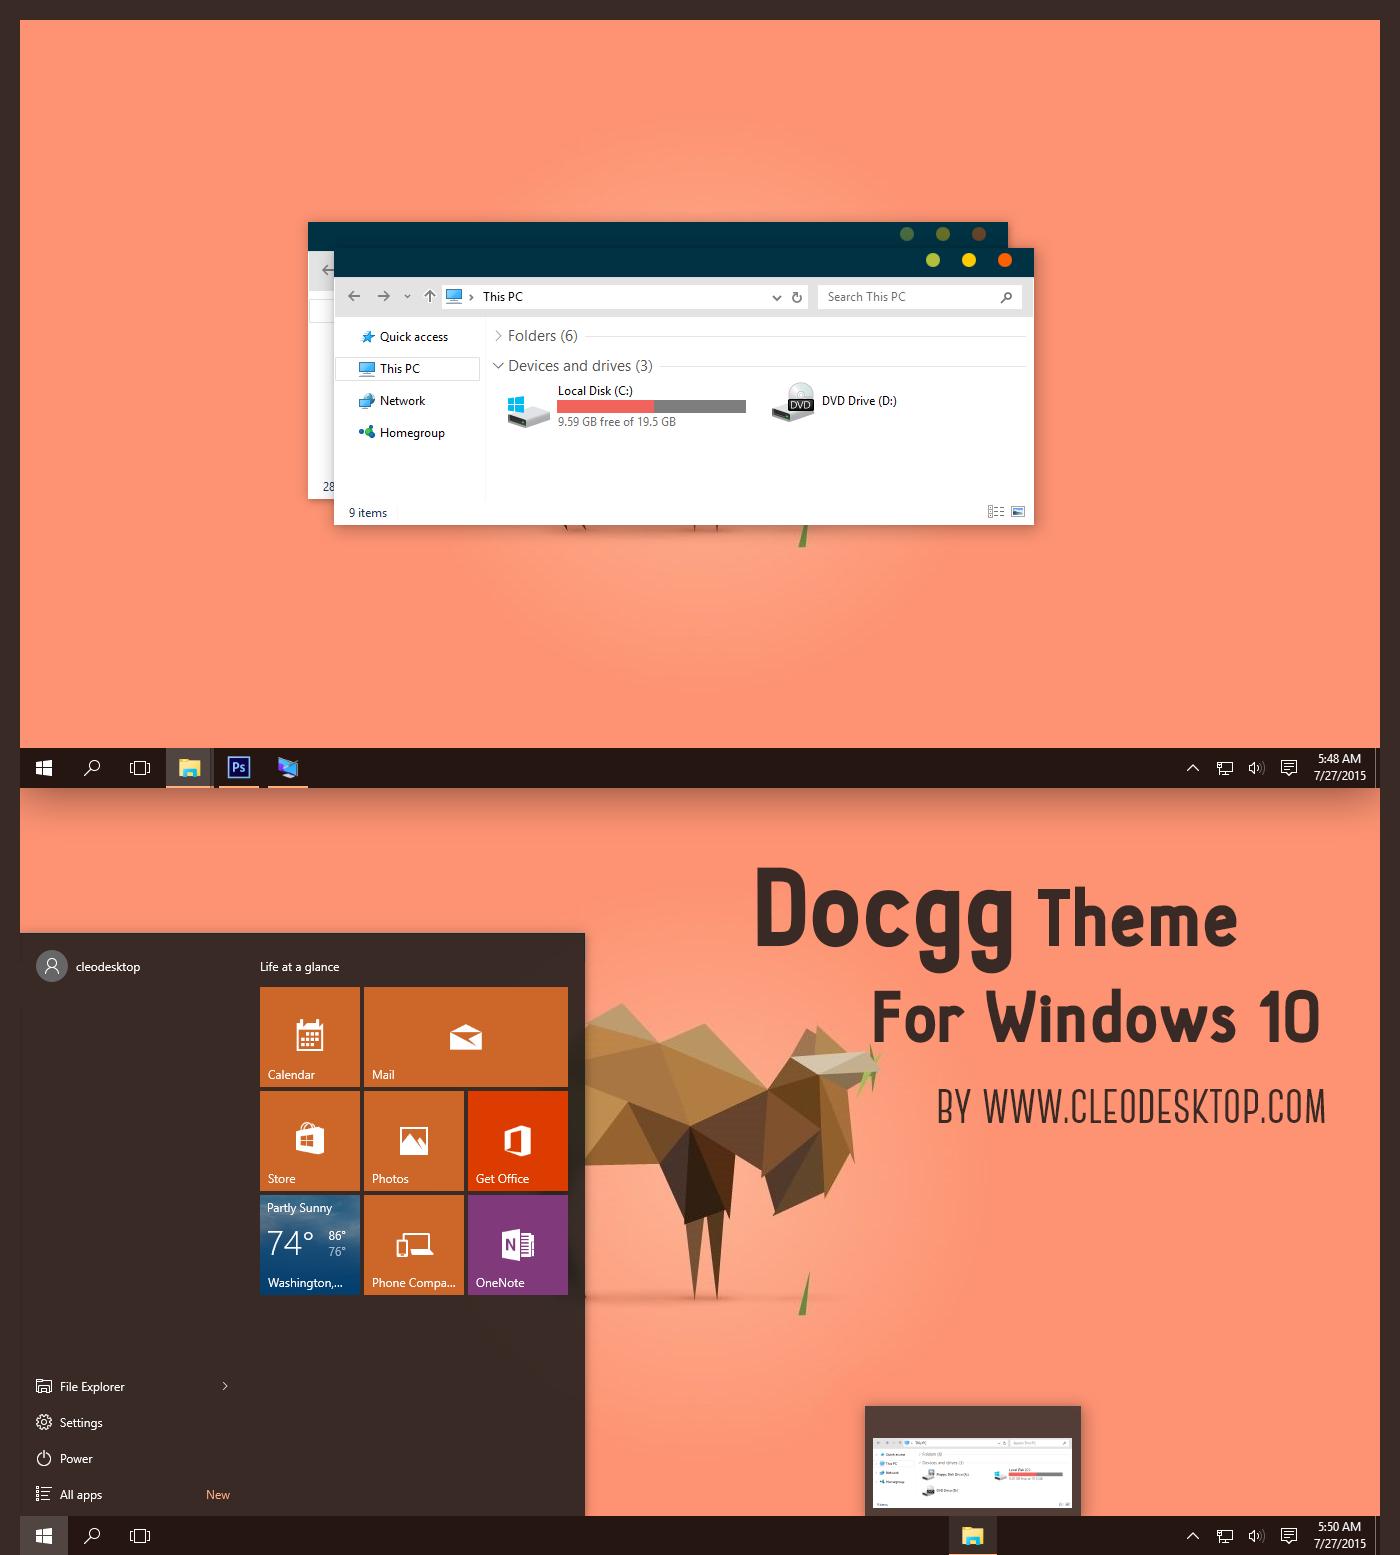 Docgg Theme For Windows 10 Rtm